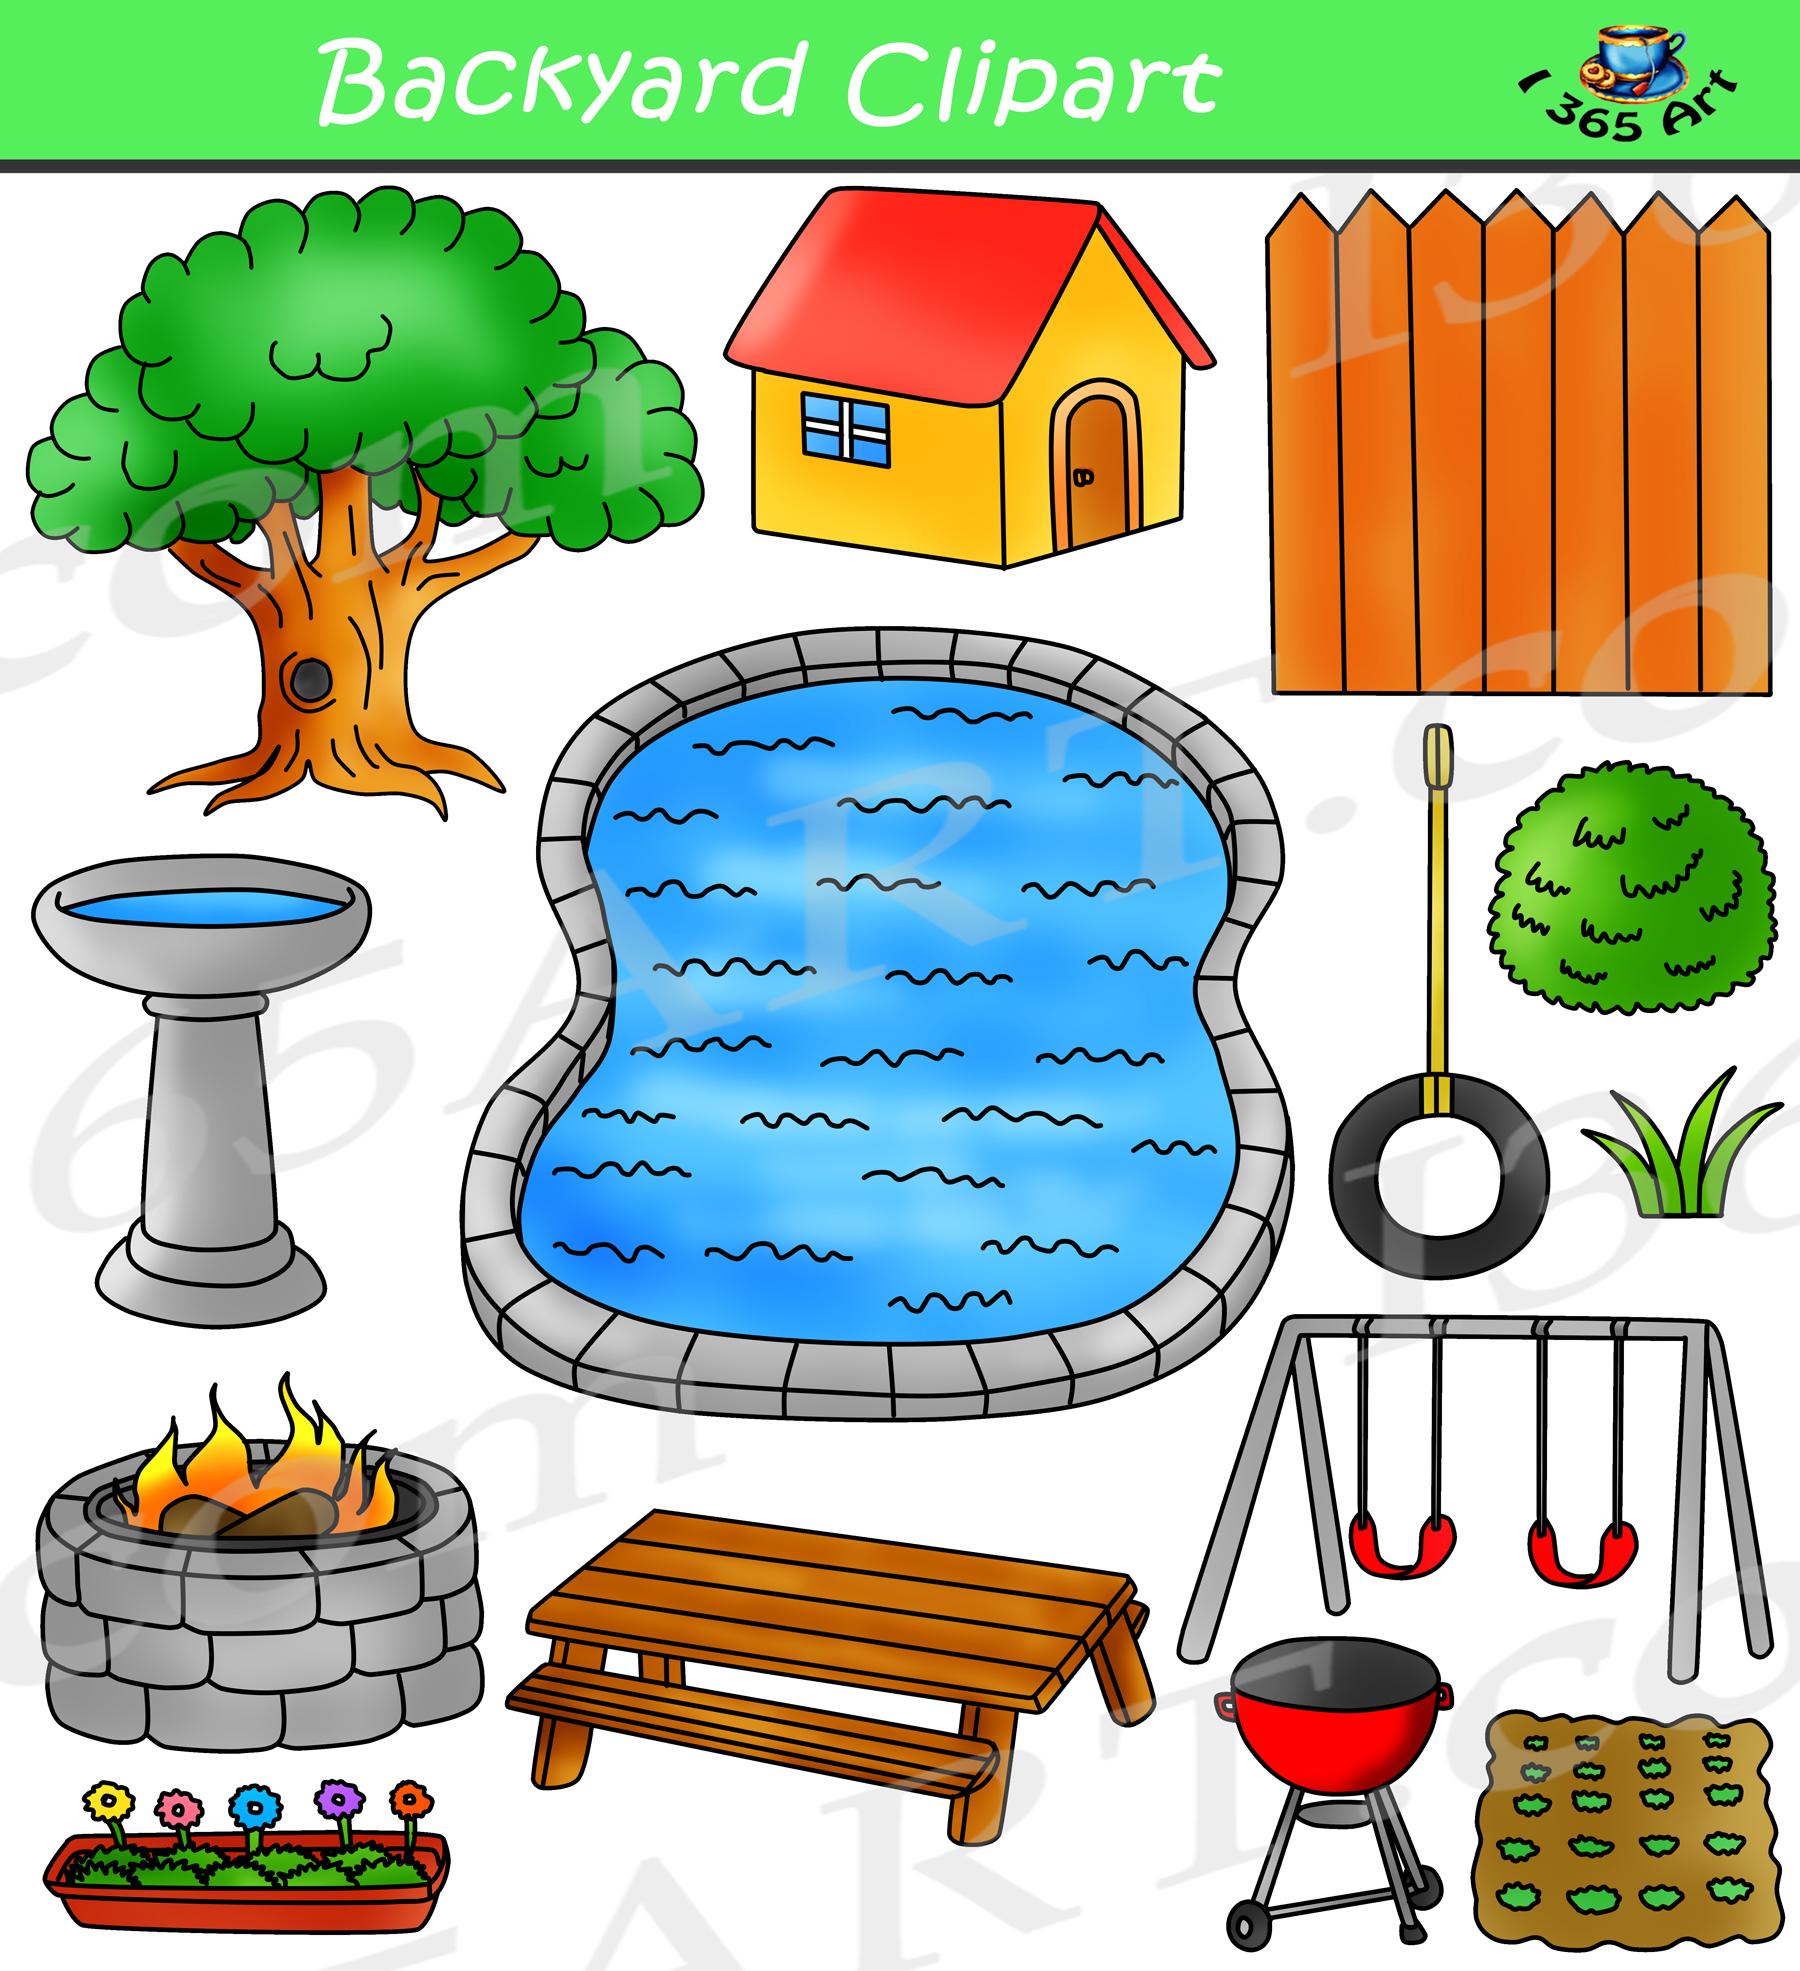 spring backyard clipart bundle build a backyard clip art school rh clipart4school com backyard clip art free backyard bbq clipart free